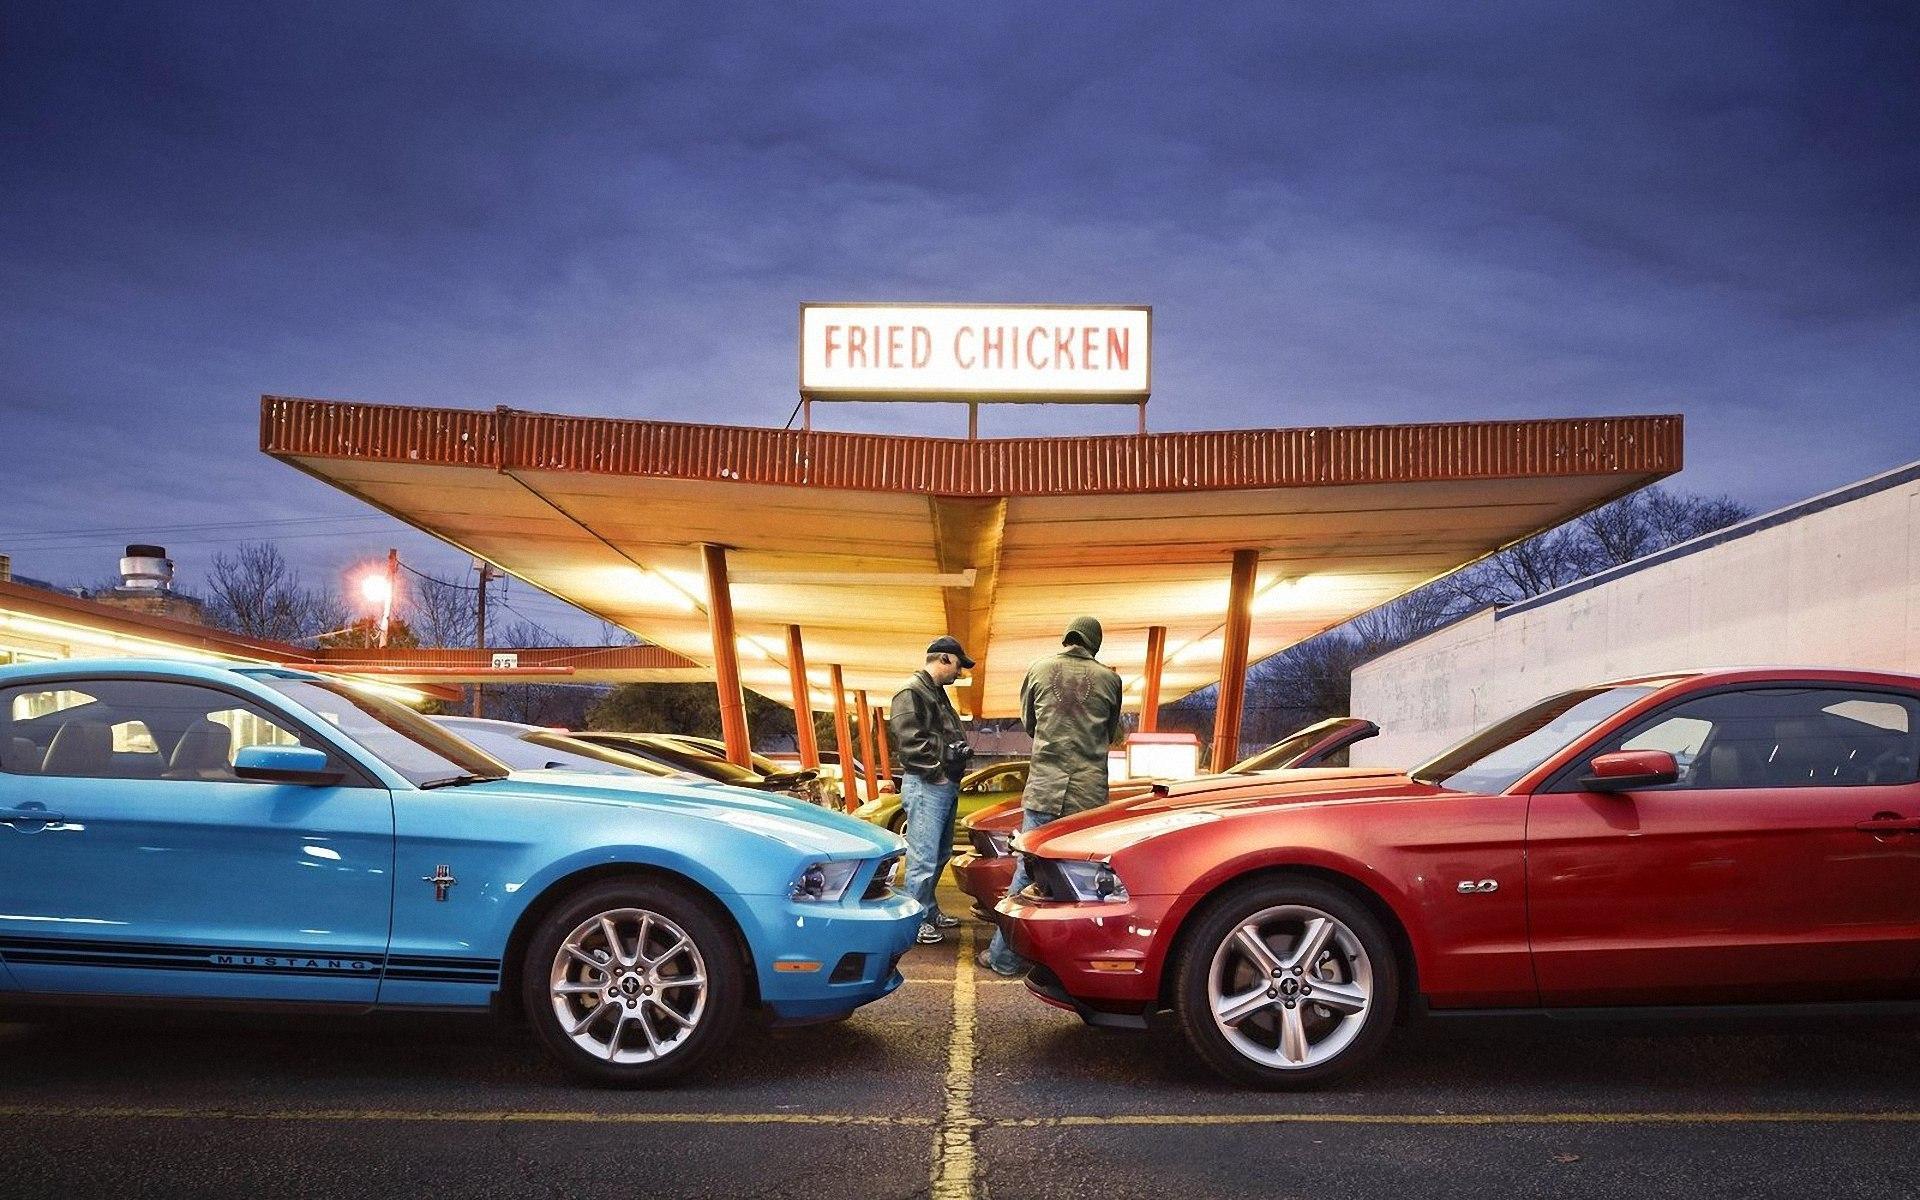 Mustang GT 2011 1920x1200 WallpapersFord Mustang 1920x1200 Wallpapers 1920x1200